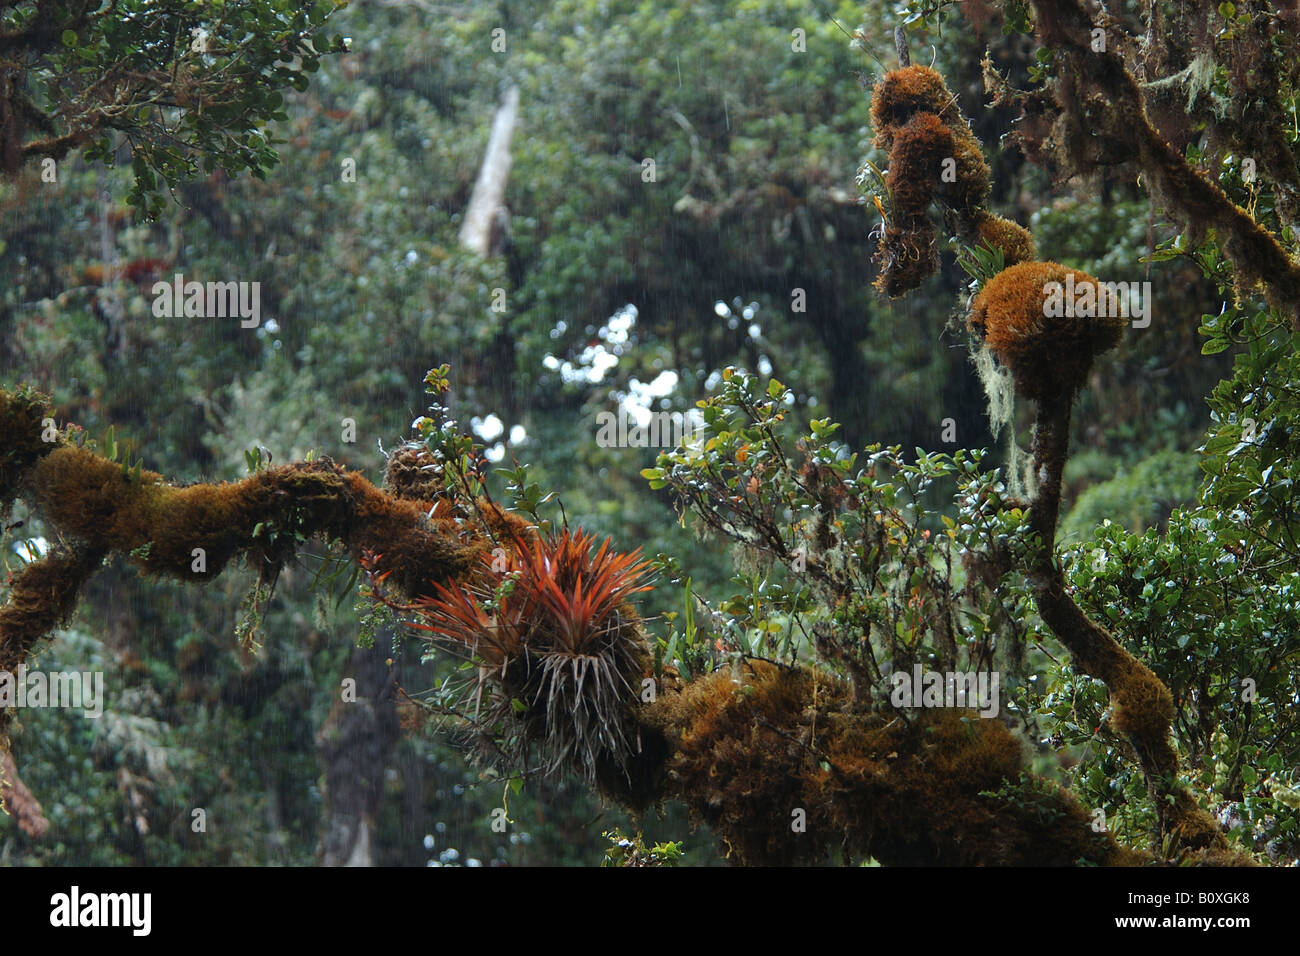 clouded forest bromeliacee epiphitic plants Cerro de la Muerte Costarica rain forest foresta pluviale tropicale foresta montana Stock Photo